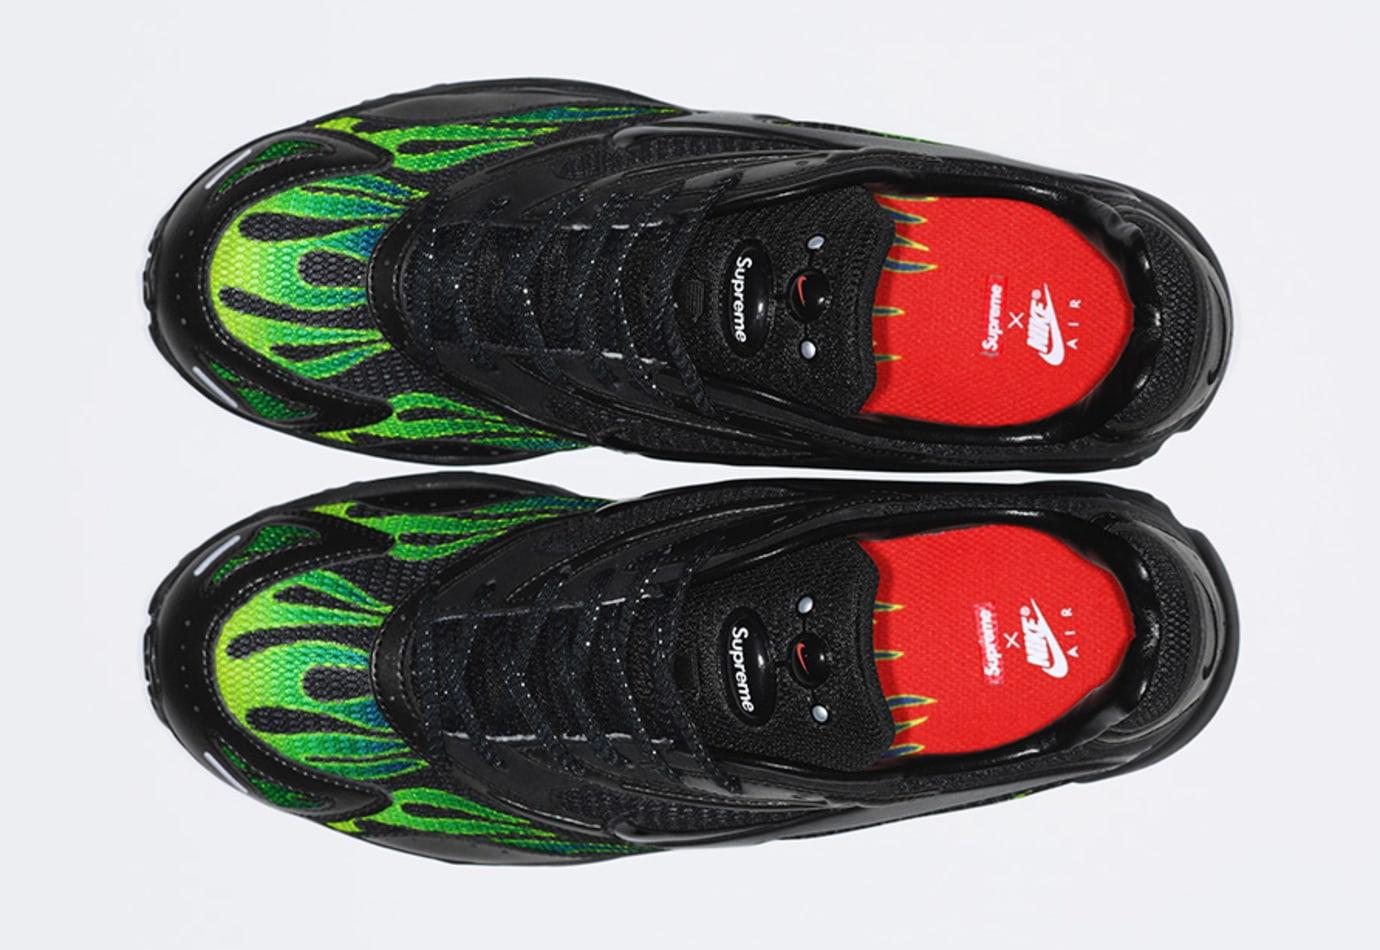 580bceeea9f0 Image via Supreme Supreme x Nike Zoom Streak Spectrum Plus AQ1279-001 (Top)